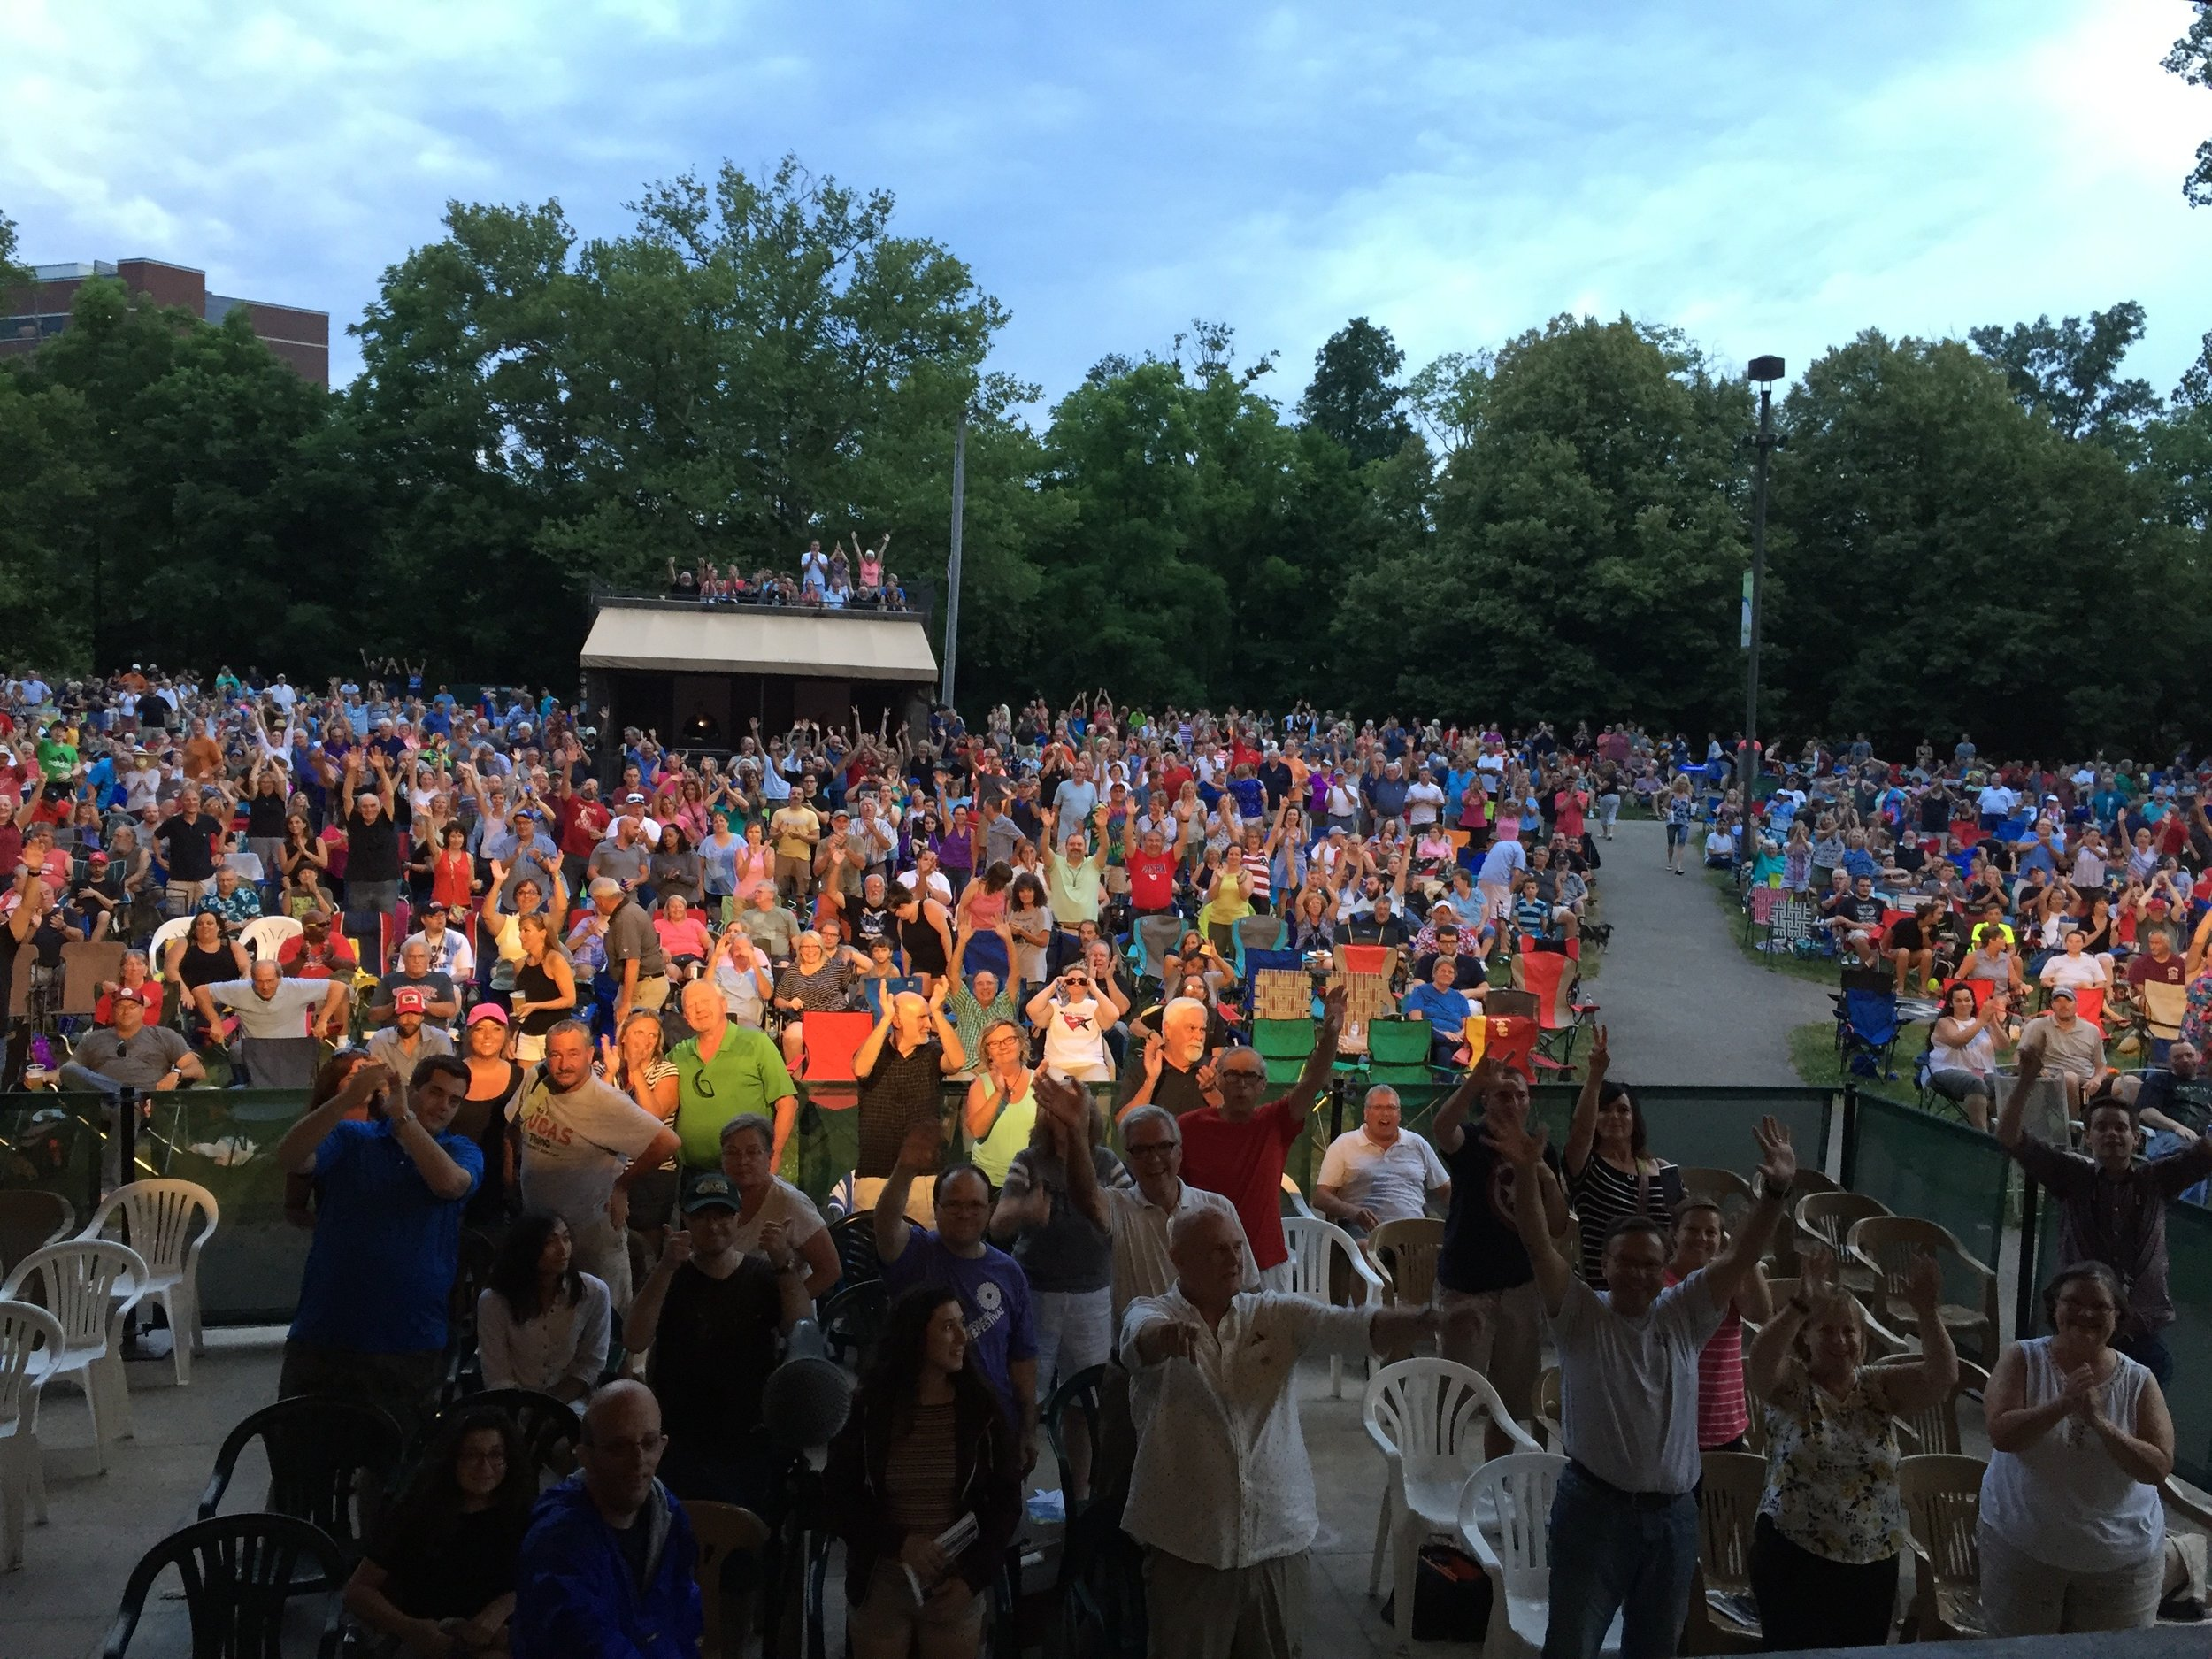 springfield OH crowd 2018.jpeg